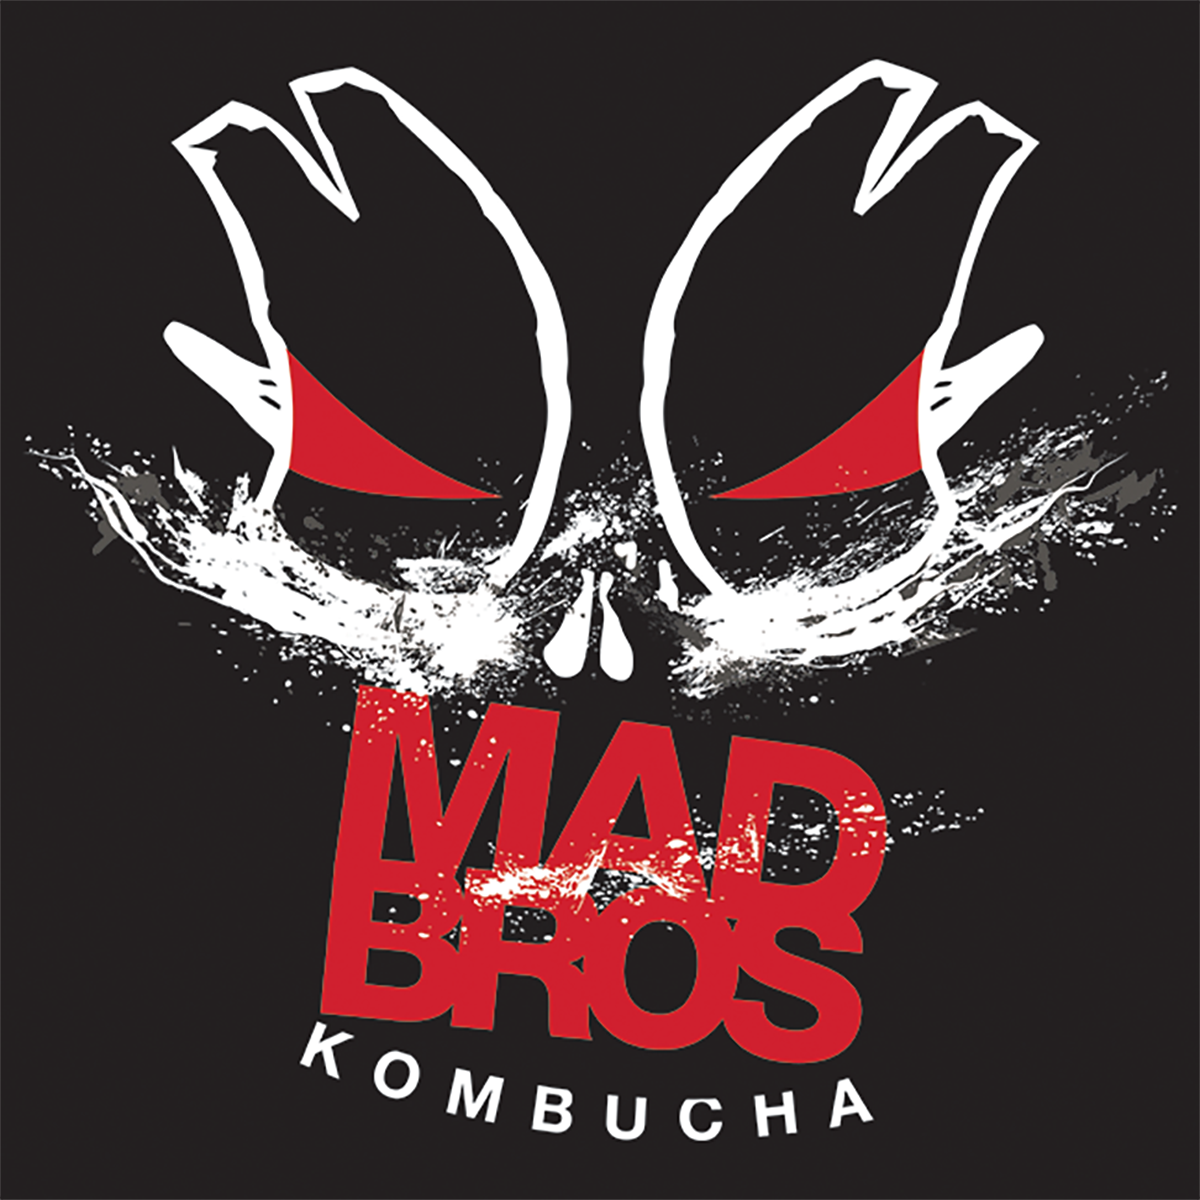 MadBros Kombucha